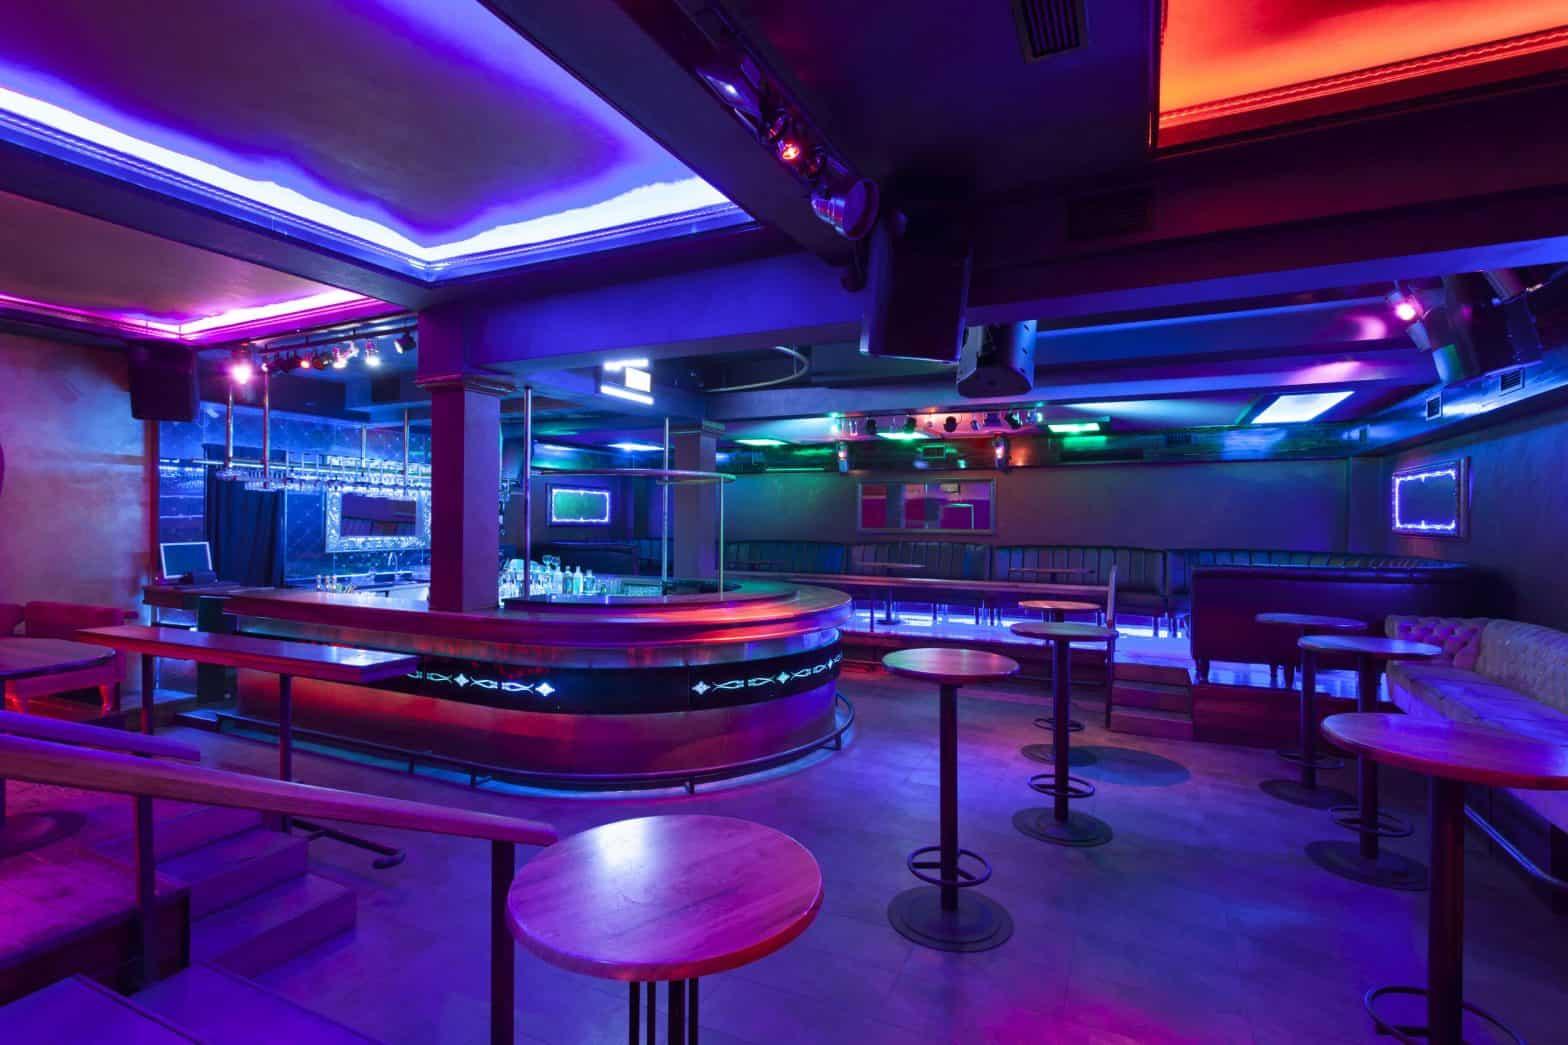 Nightclub with colorful lights